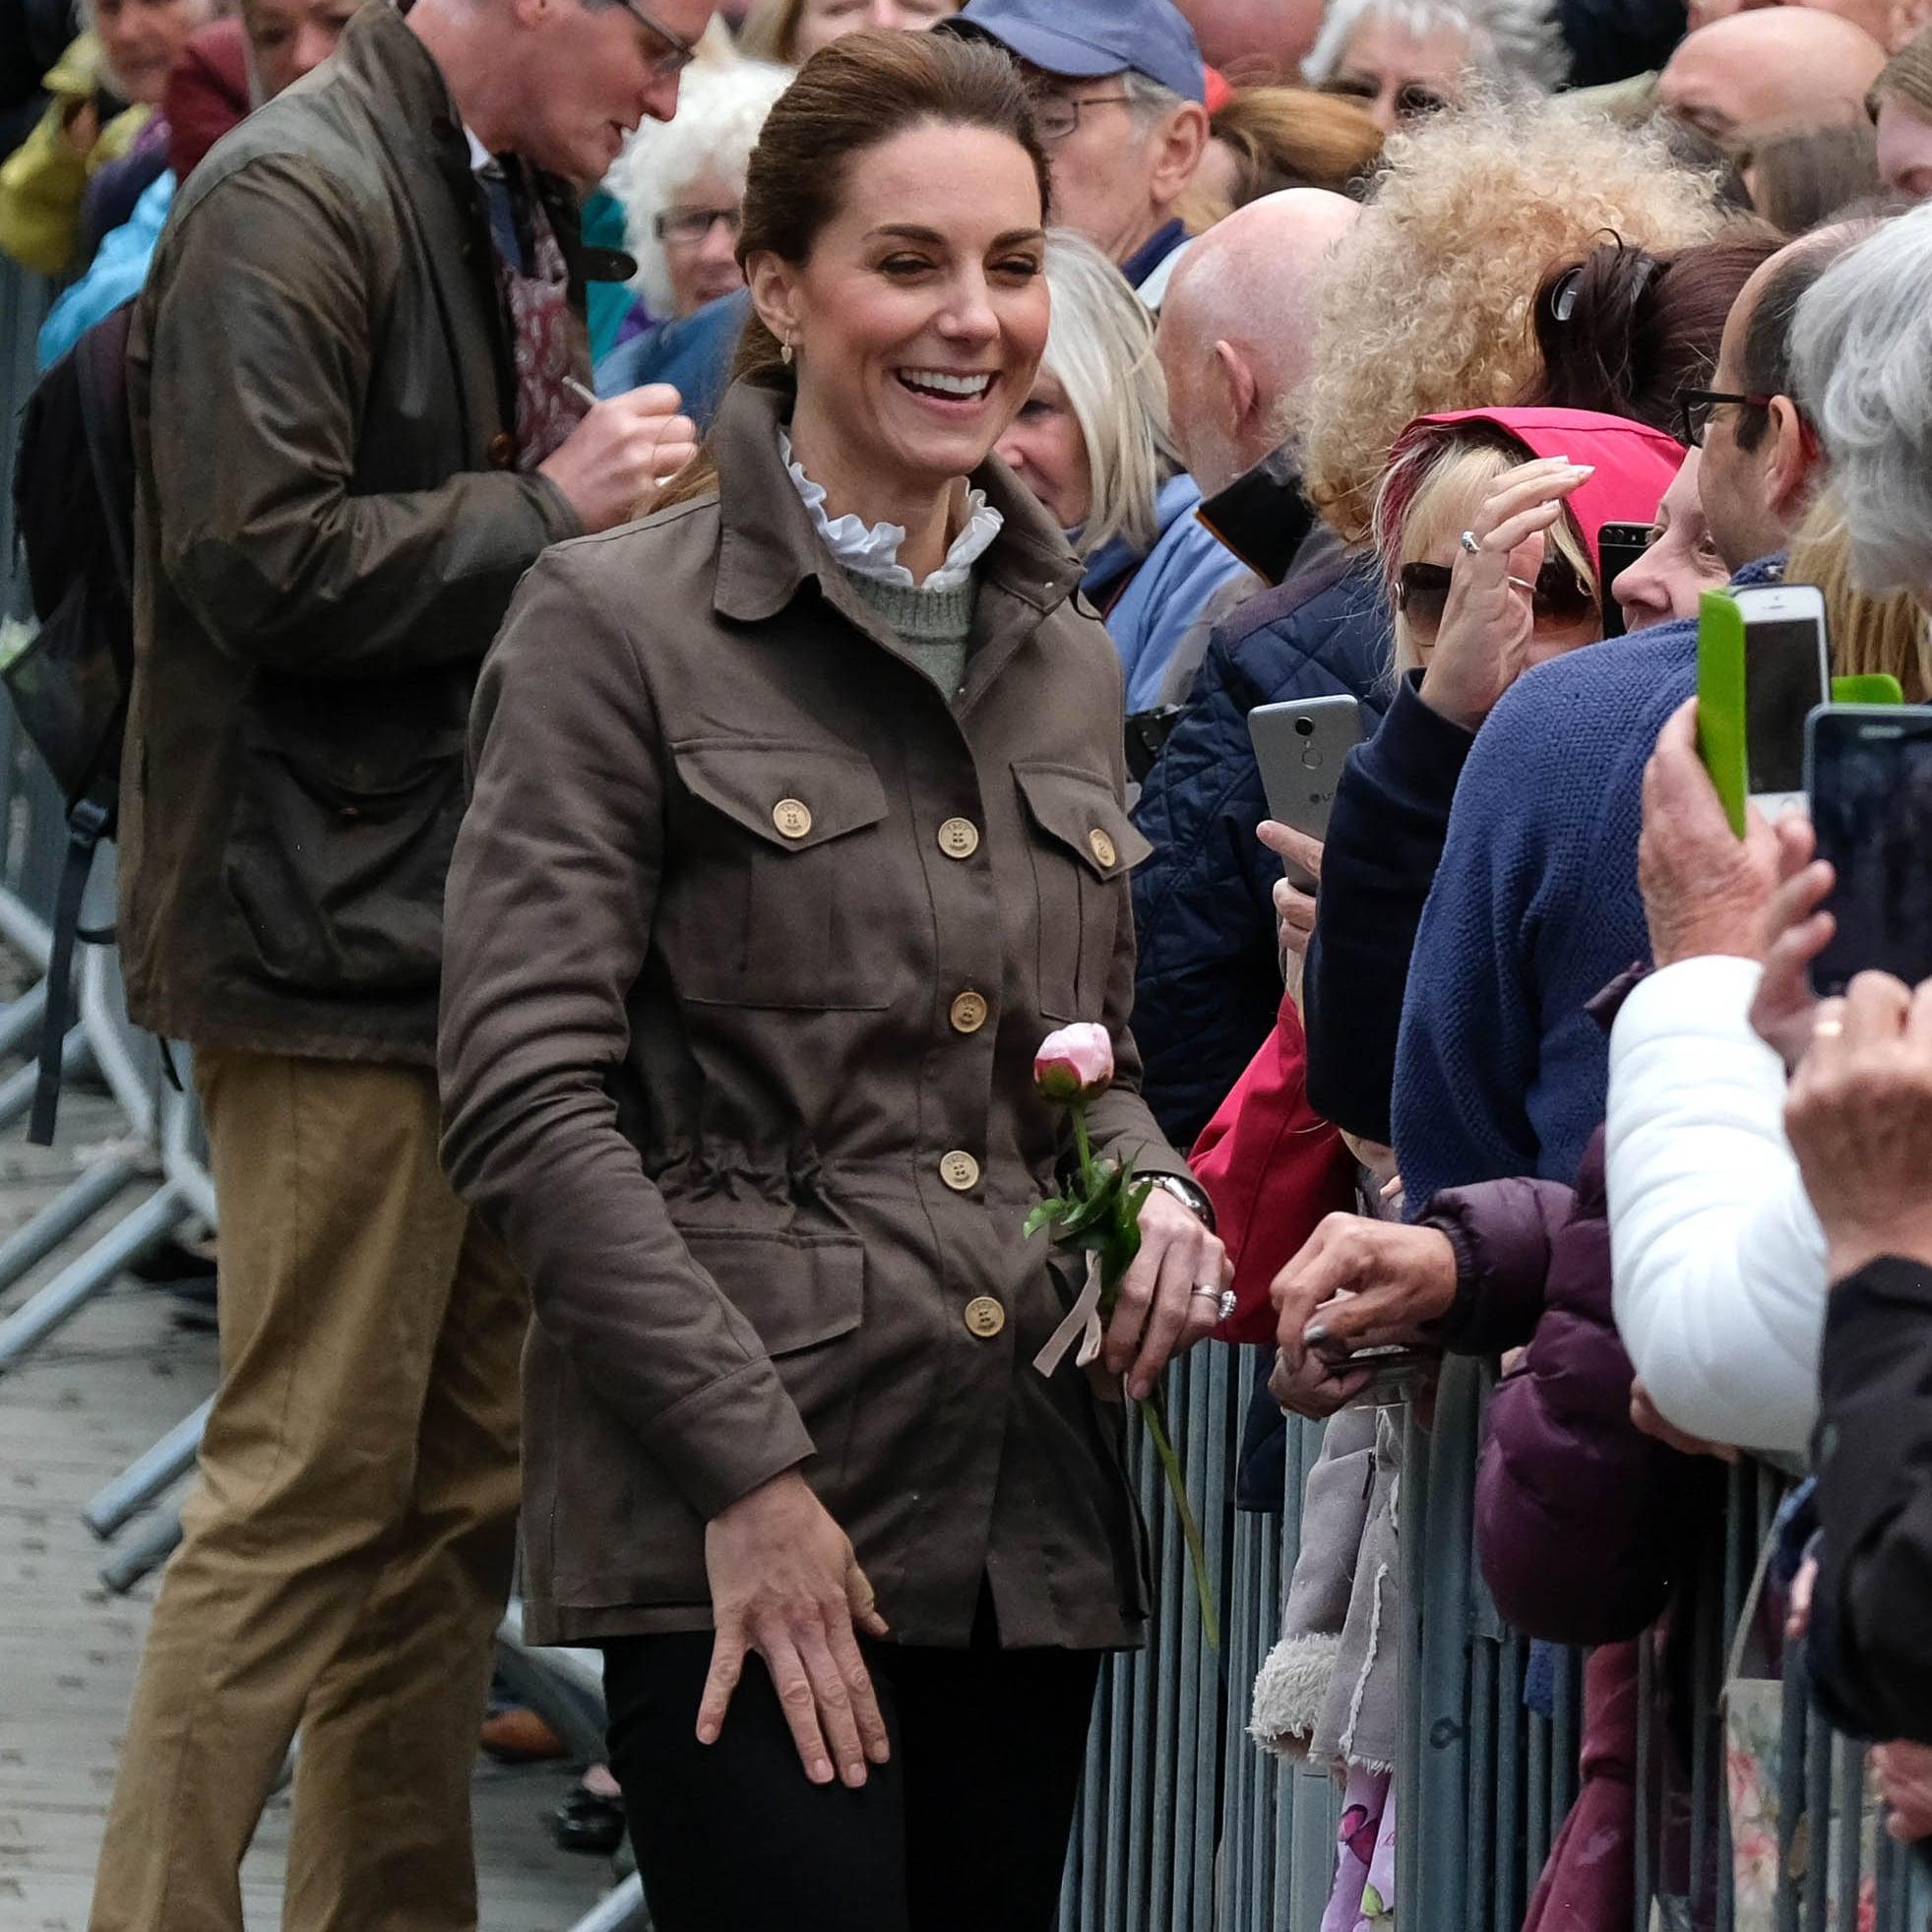 Kate Middleton Has Best Response When Little Girl Asks Why She Didn't Wear 'Princess Elsa Dress'